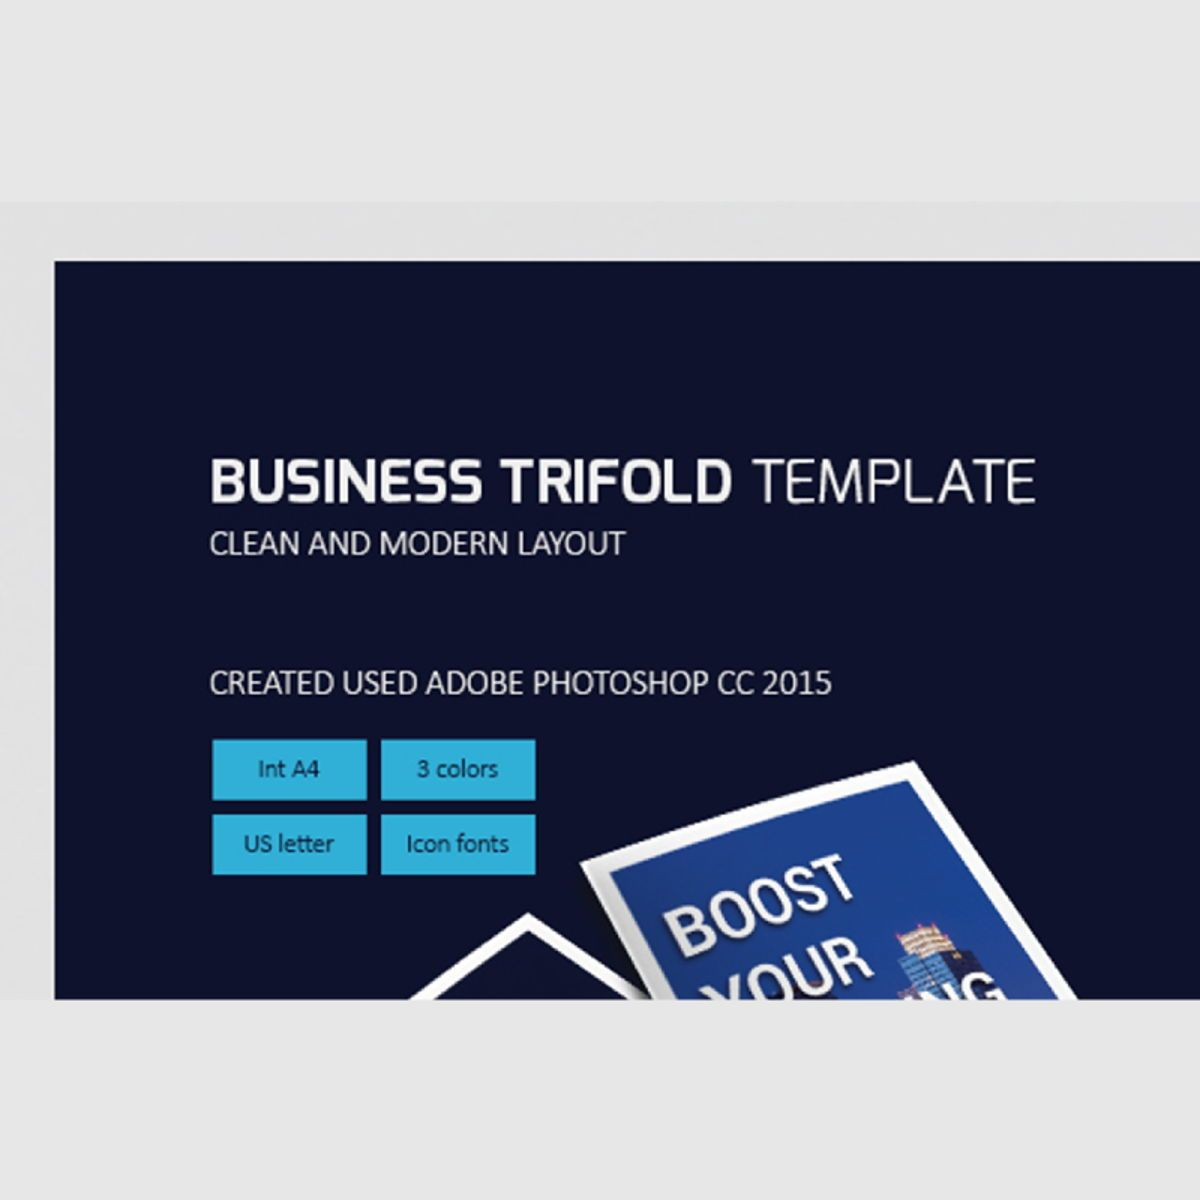 Business Company Trifold Photoshop Template, 08448, Business — PoweredTemplate.com